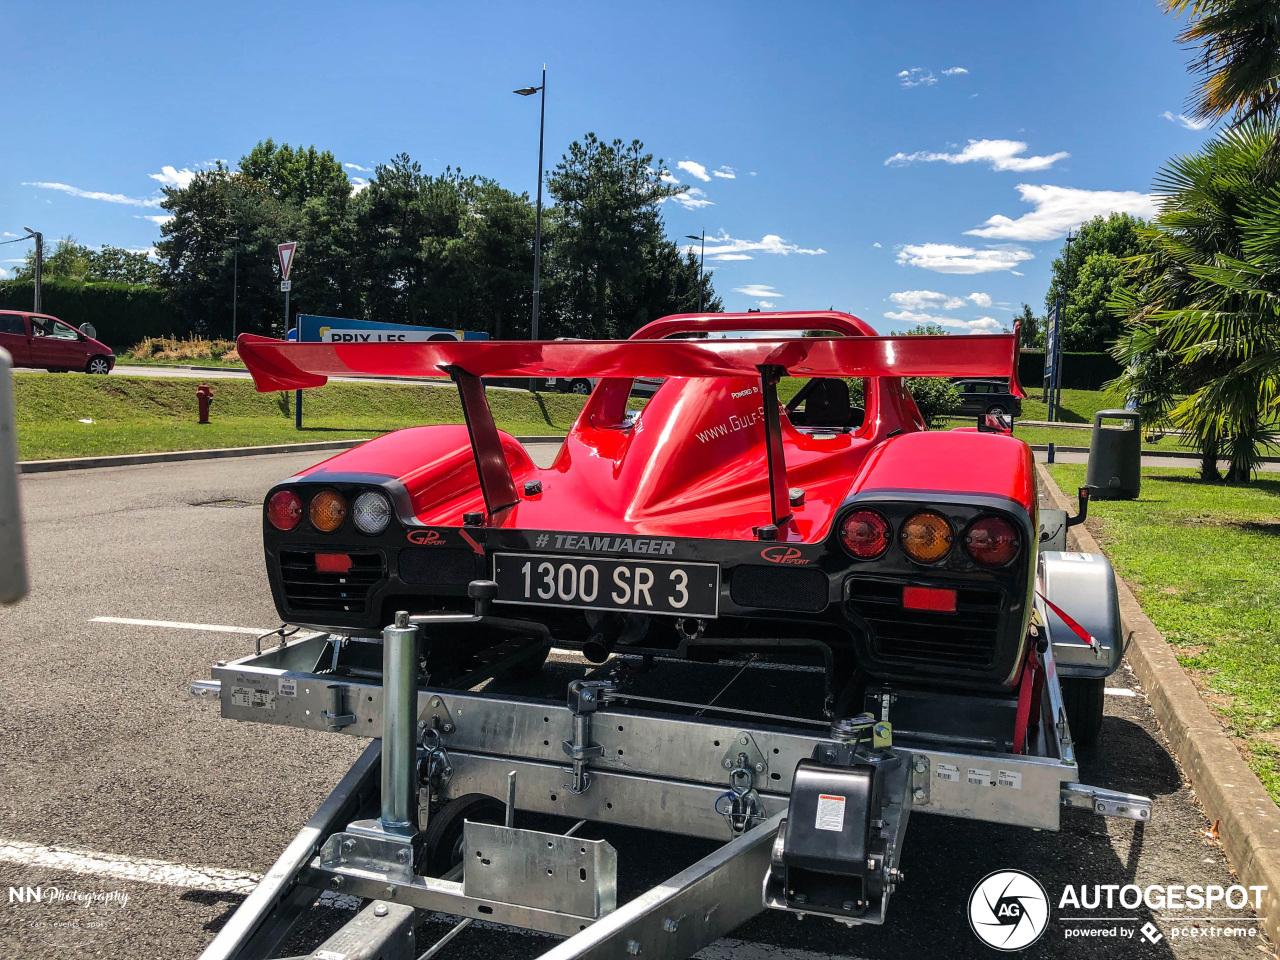 Radical SR3 1300 Supersport - 10 August 2019 - Autogespot